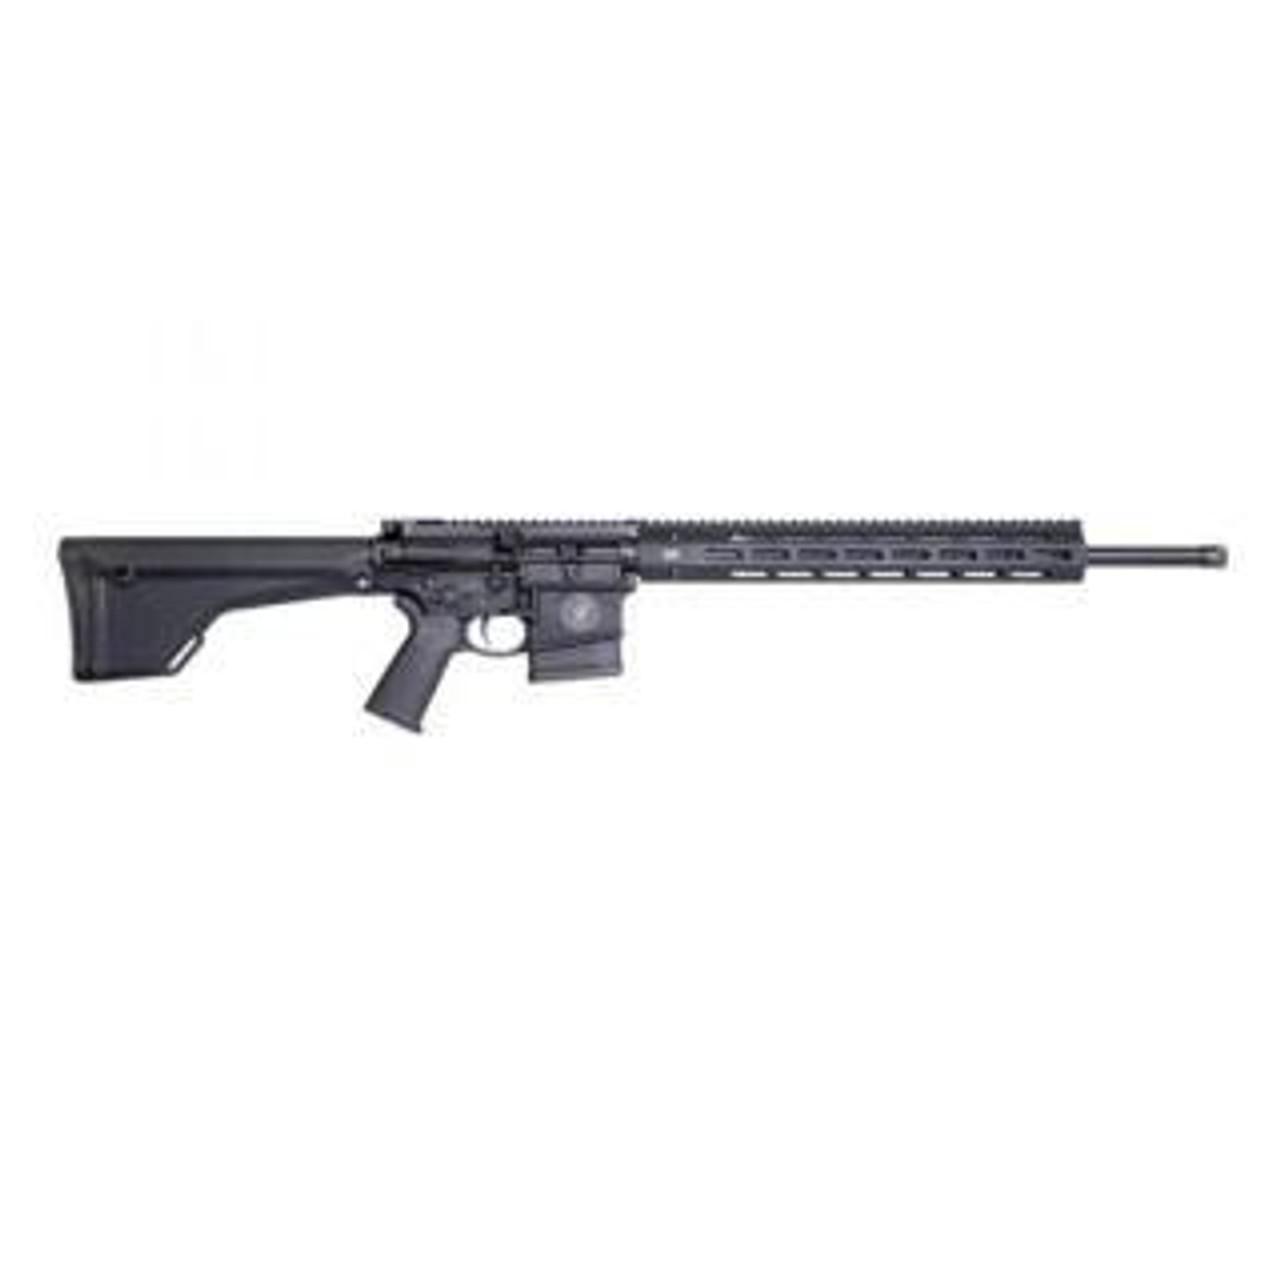 Smith & Wesson M&P10 M-LOK CALIFORNIA LEGAL - 6.5 Creedmoor